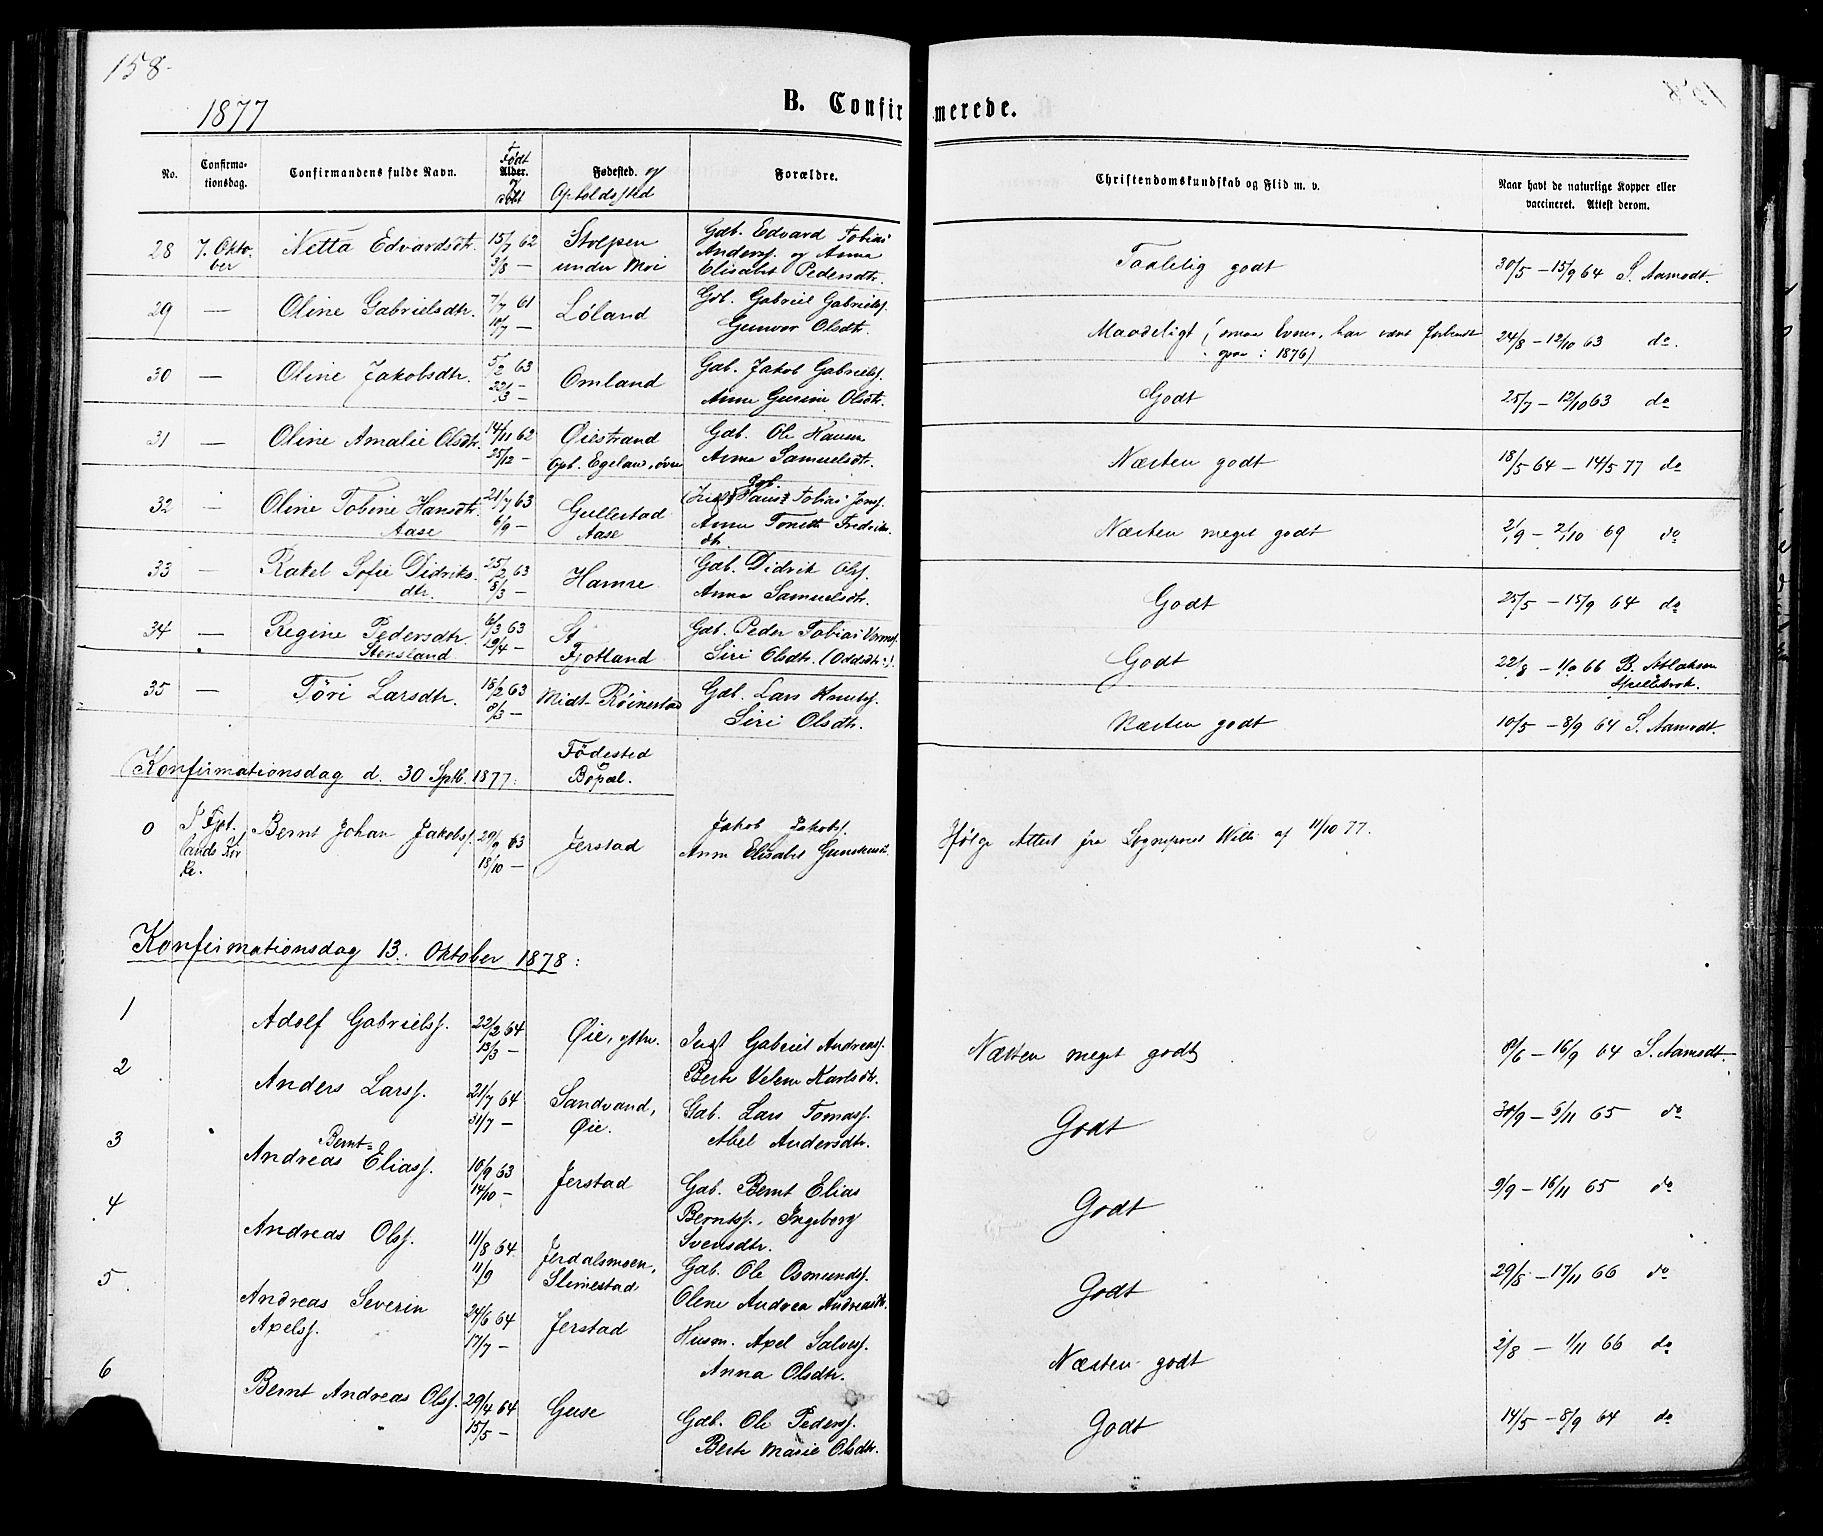 SAK, Kvinesdal sokneprestkontor, F/Fa/Fab/L0007: Ministerialbok nr. A 7, 1870-1885, s. 158